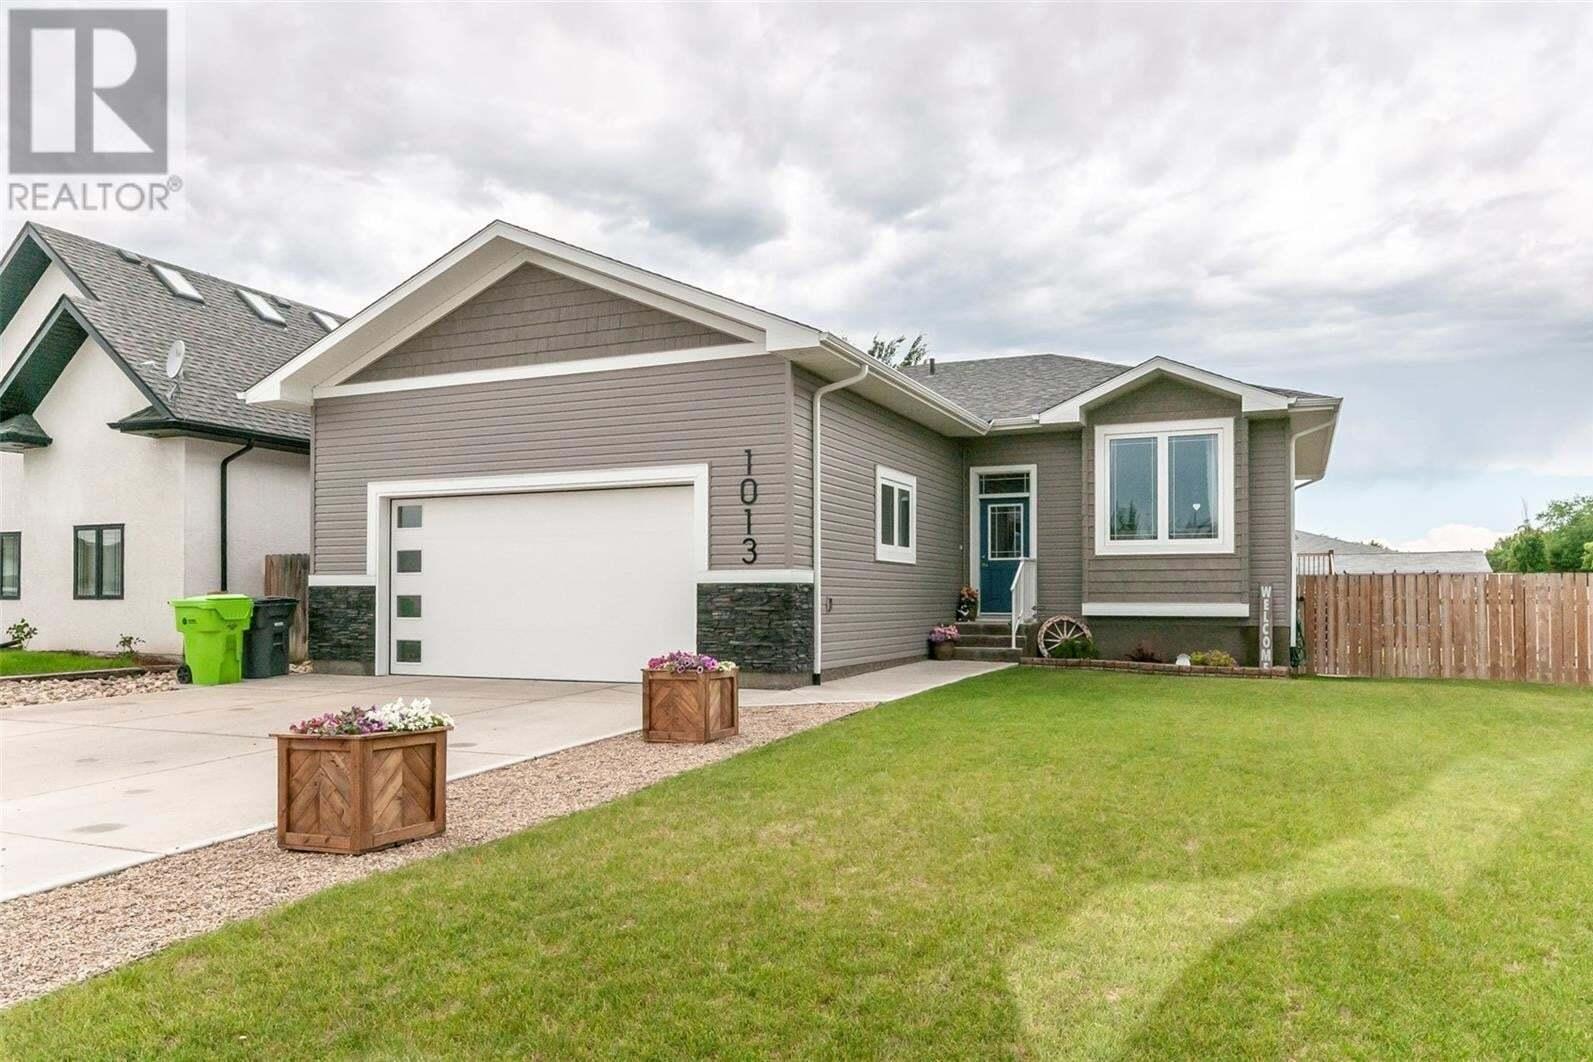 House for sale at 1013 Otterloo St Indian Head Saskatchewan - MLS: SK814752